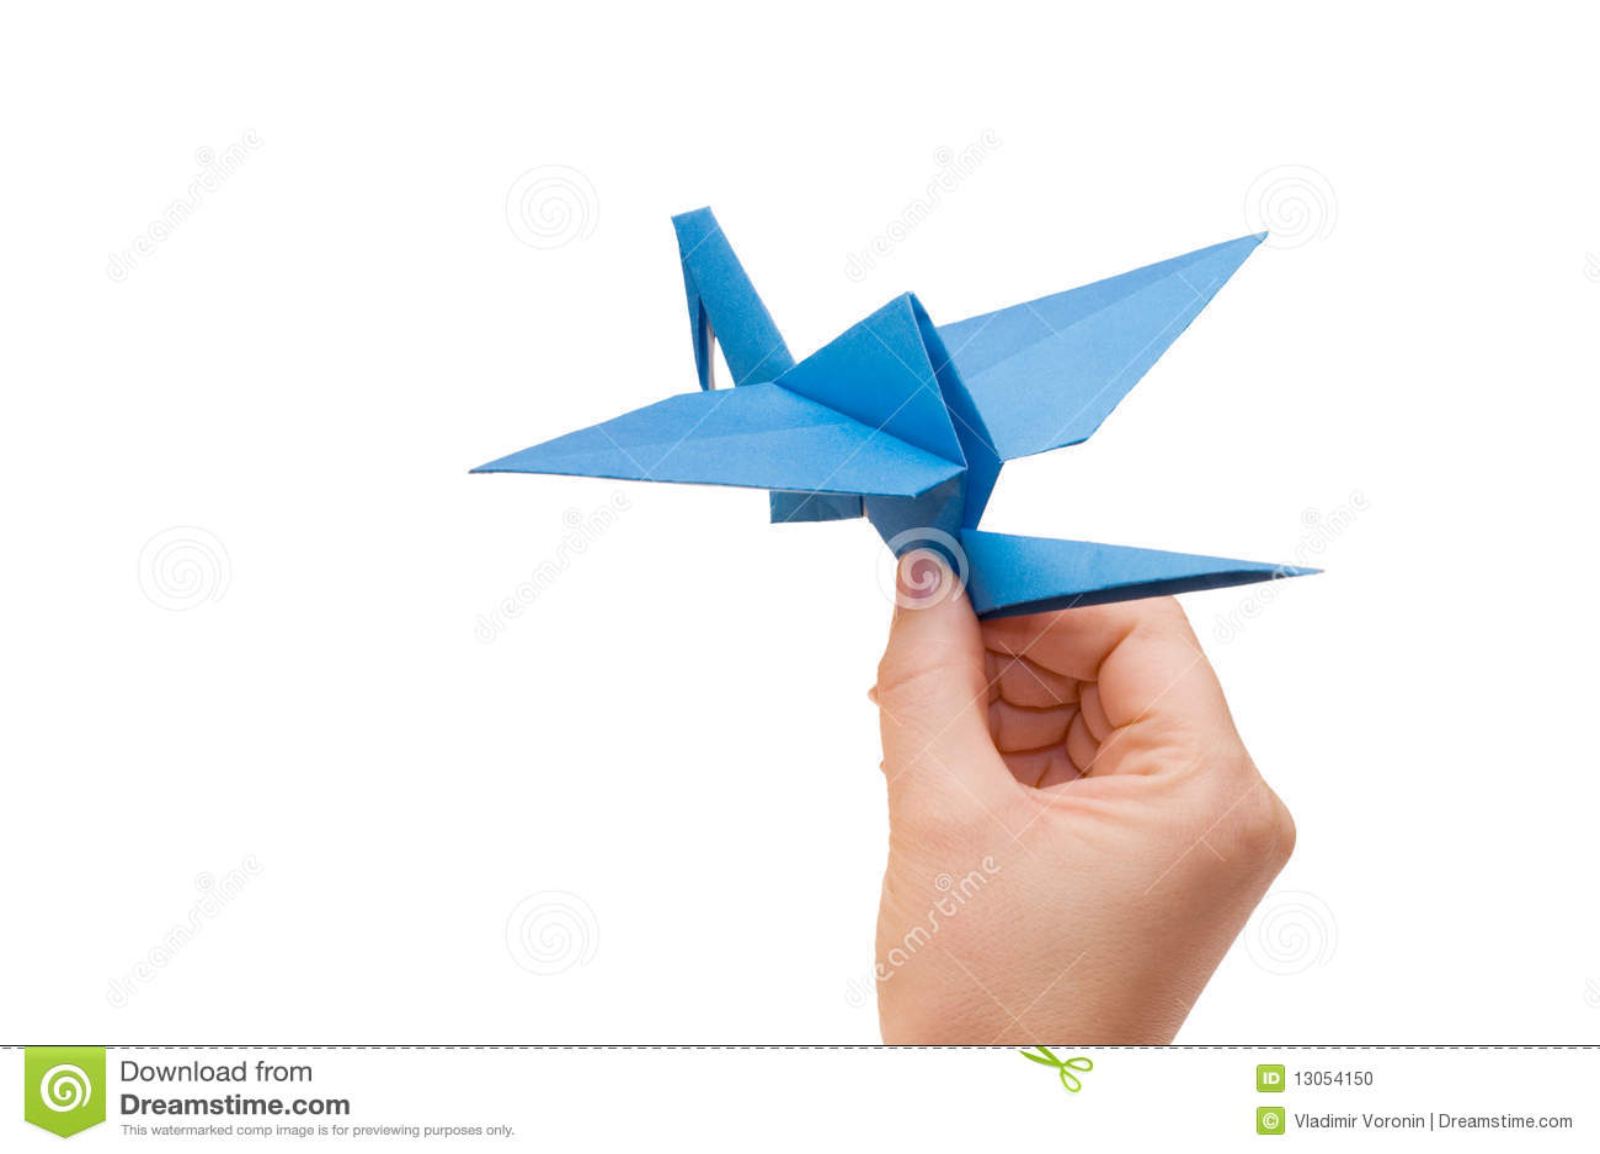 Goldpulver Flash, Hand Origami, Papierkrane, Origami, Dekorpapier:  Amazon.de: Küche & Haushalt | 954x1300